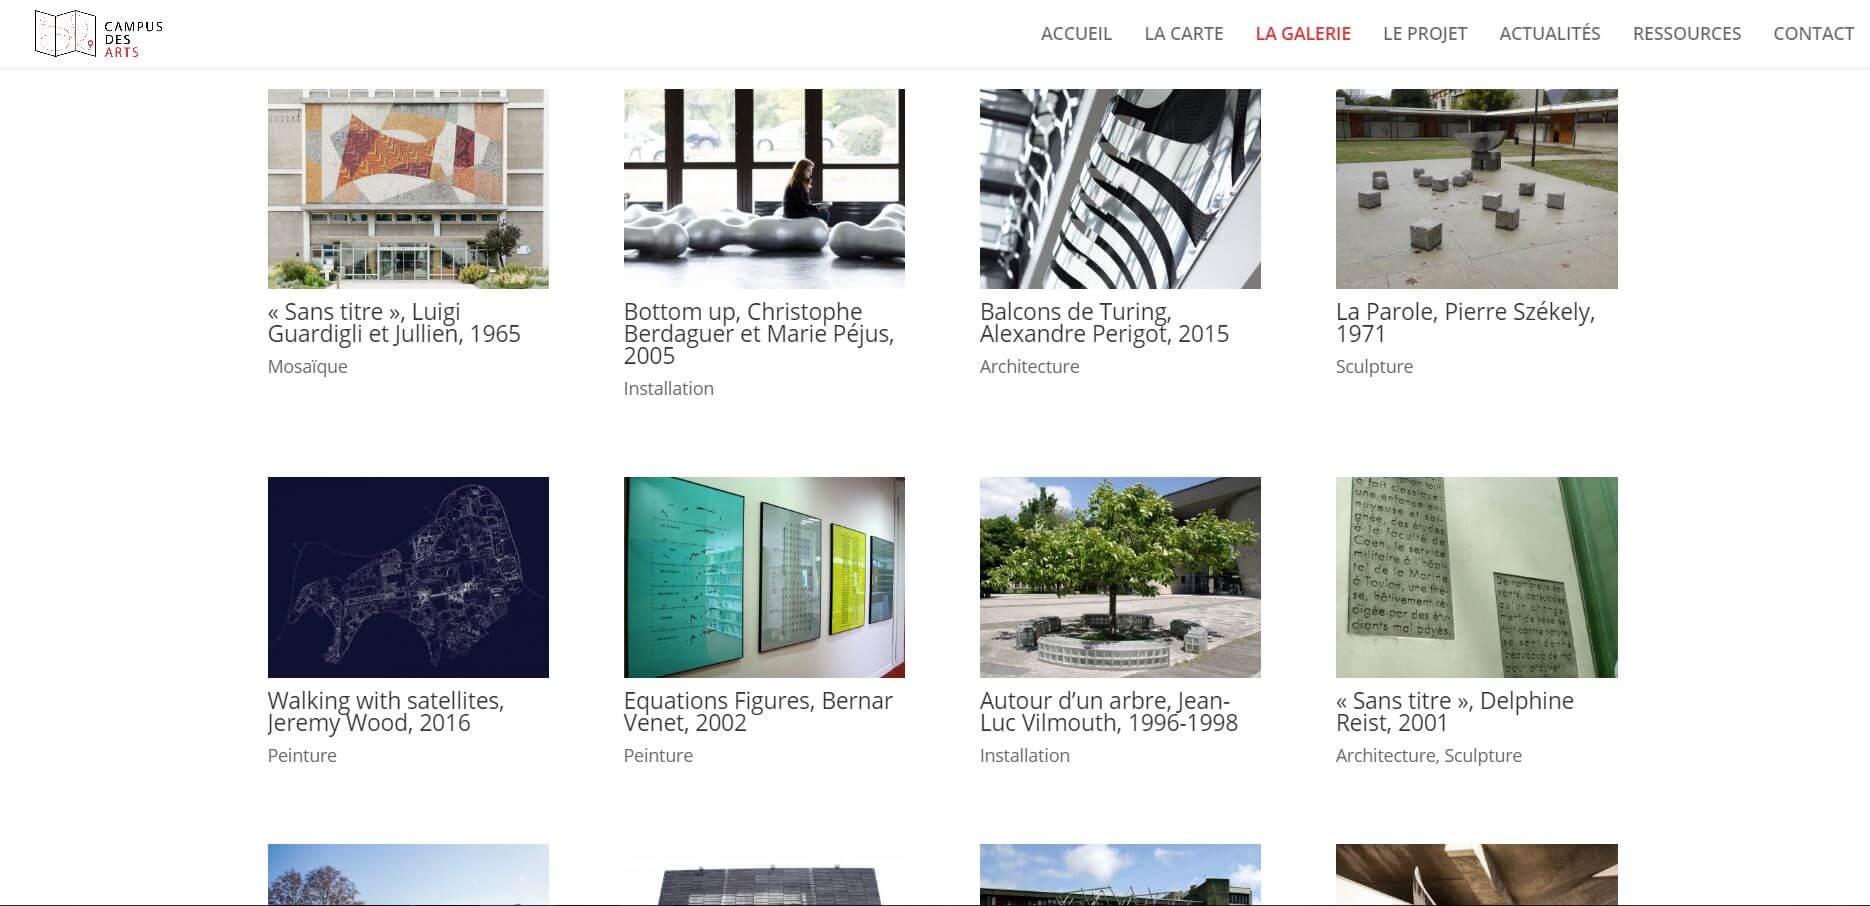 2016-17-campus-des-arts-galerie.jpg